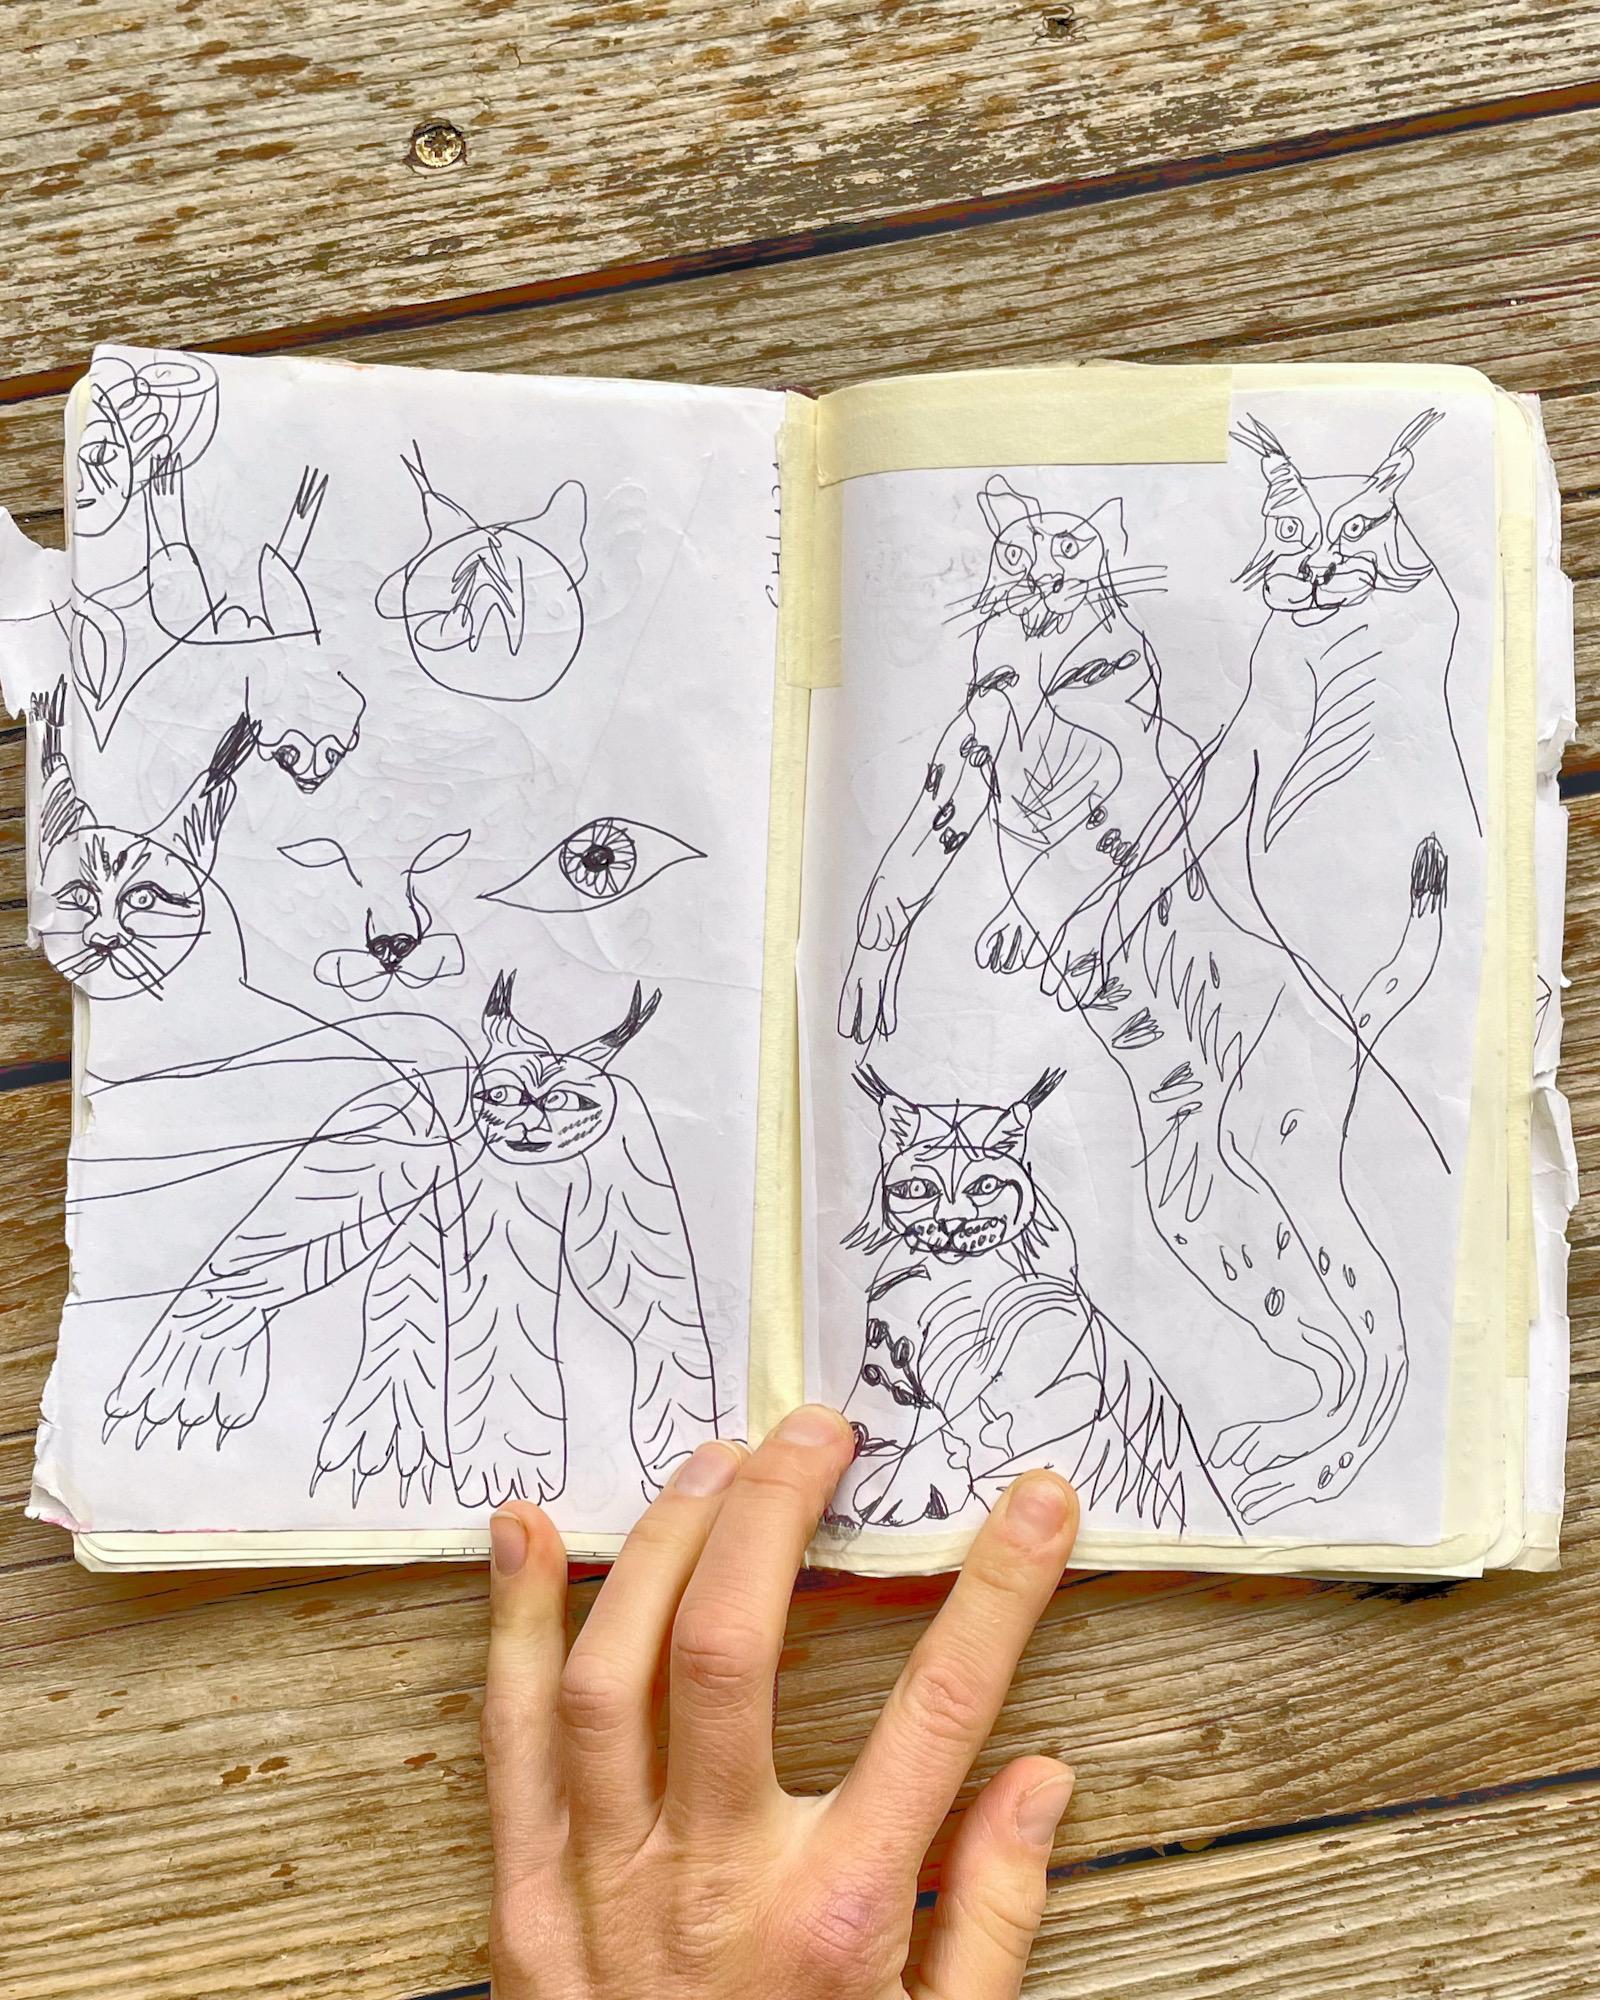 gravgrav: insignia sketches and concept drafts